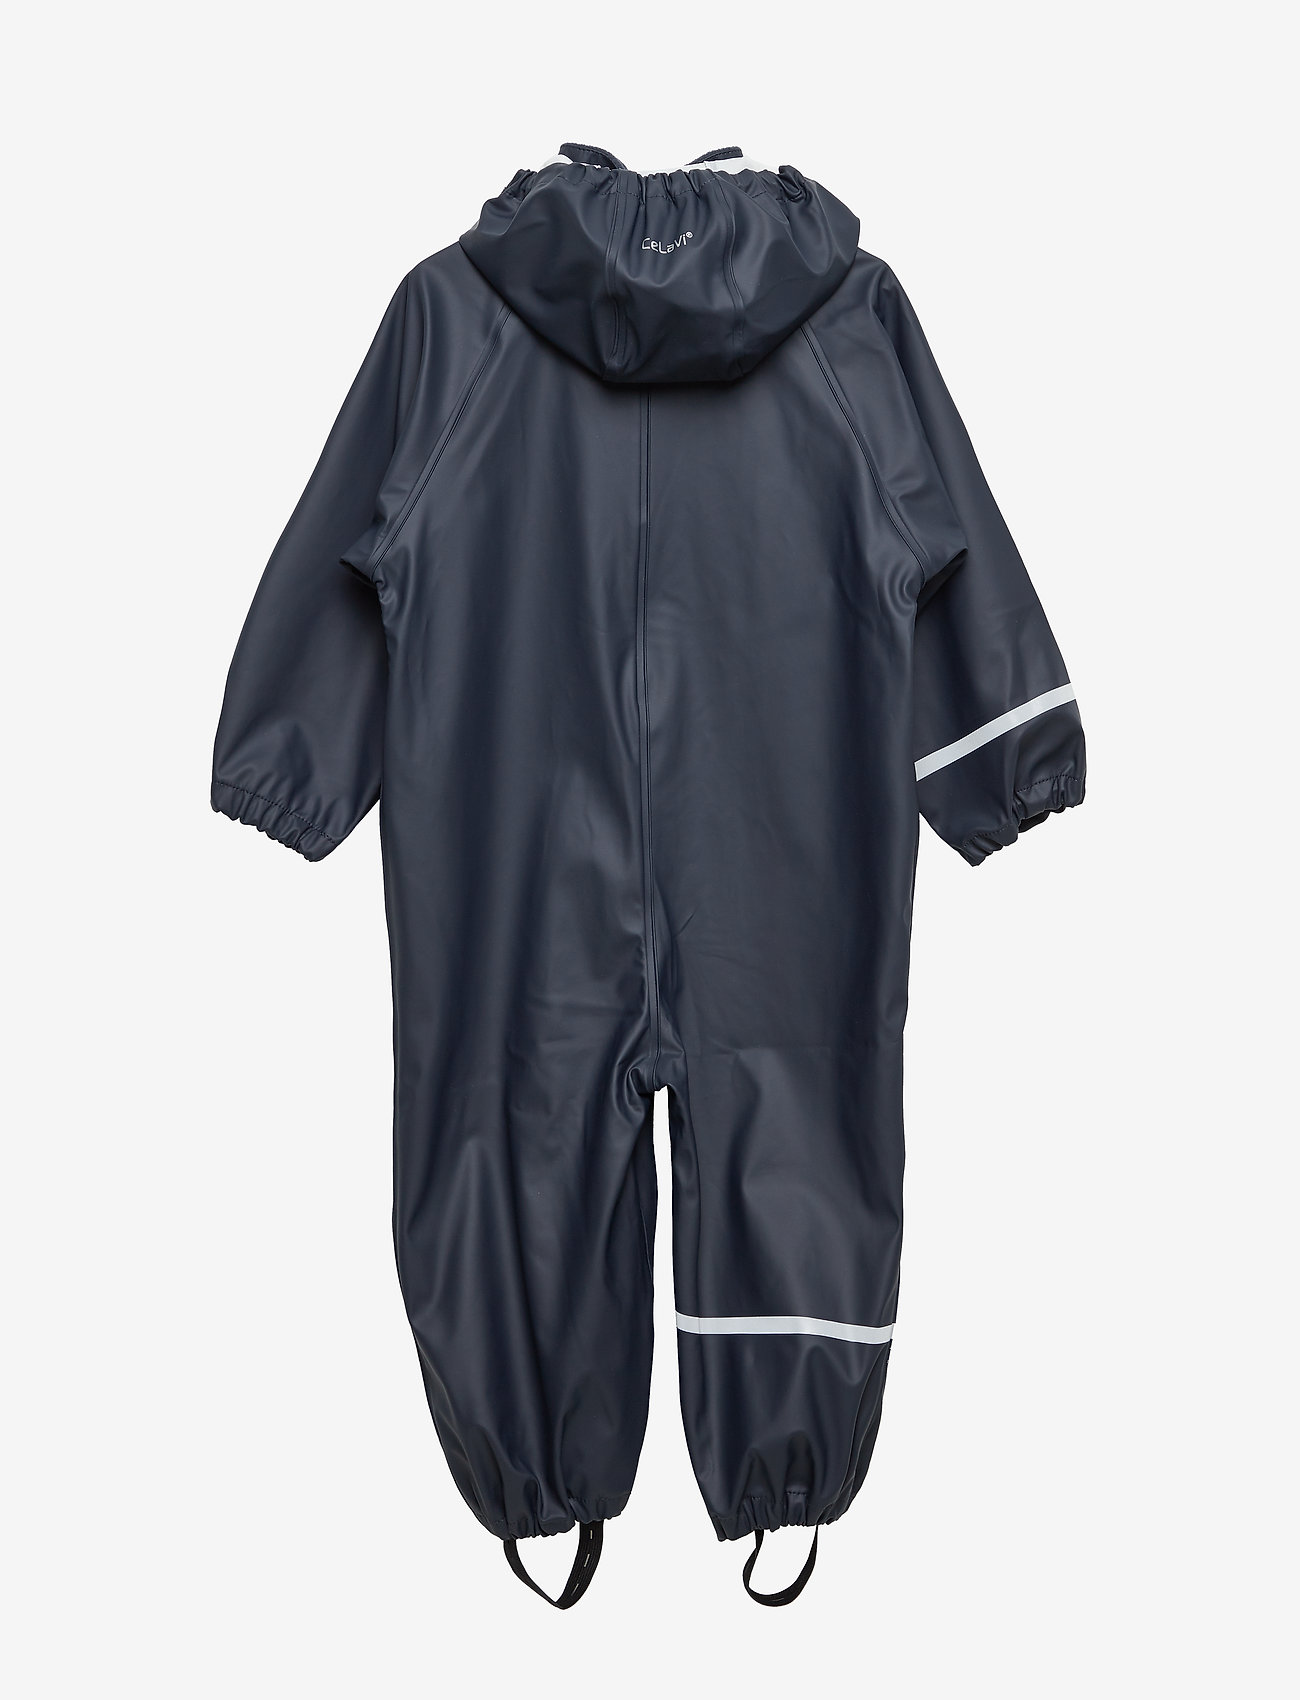 CeLaVi - Rainwear suit -PU - ensembles - dark navy - 1